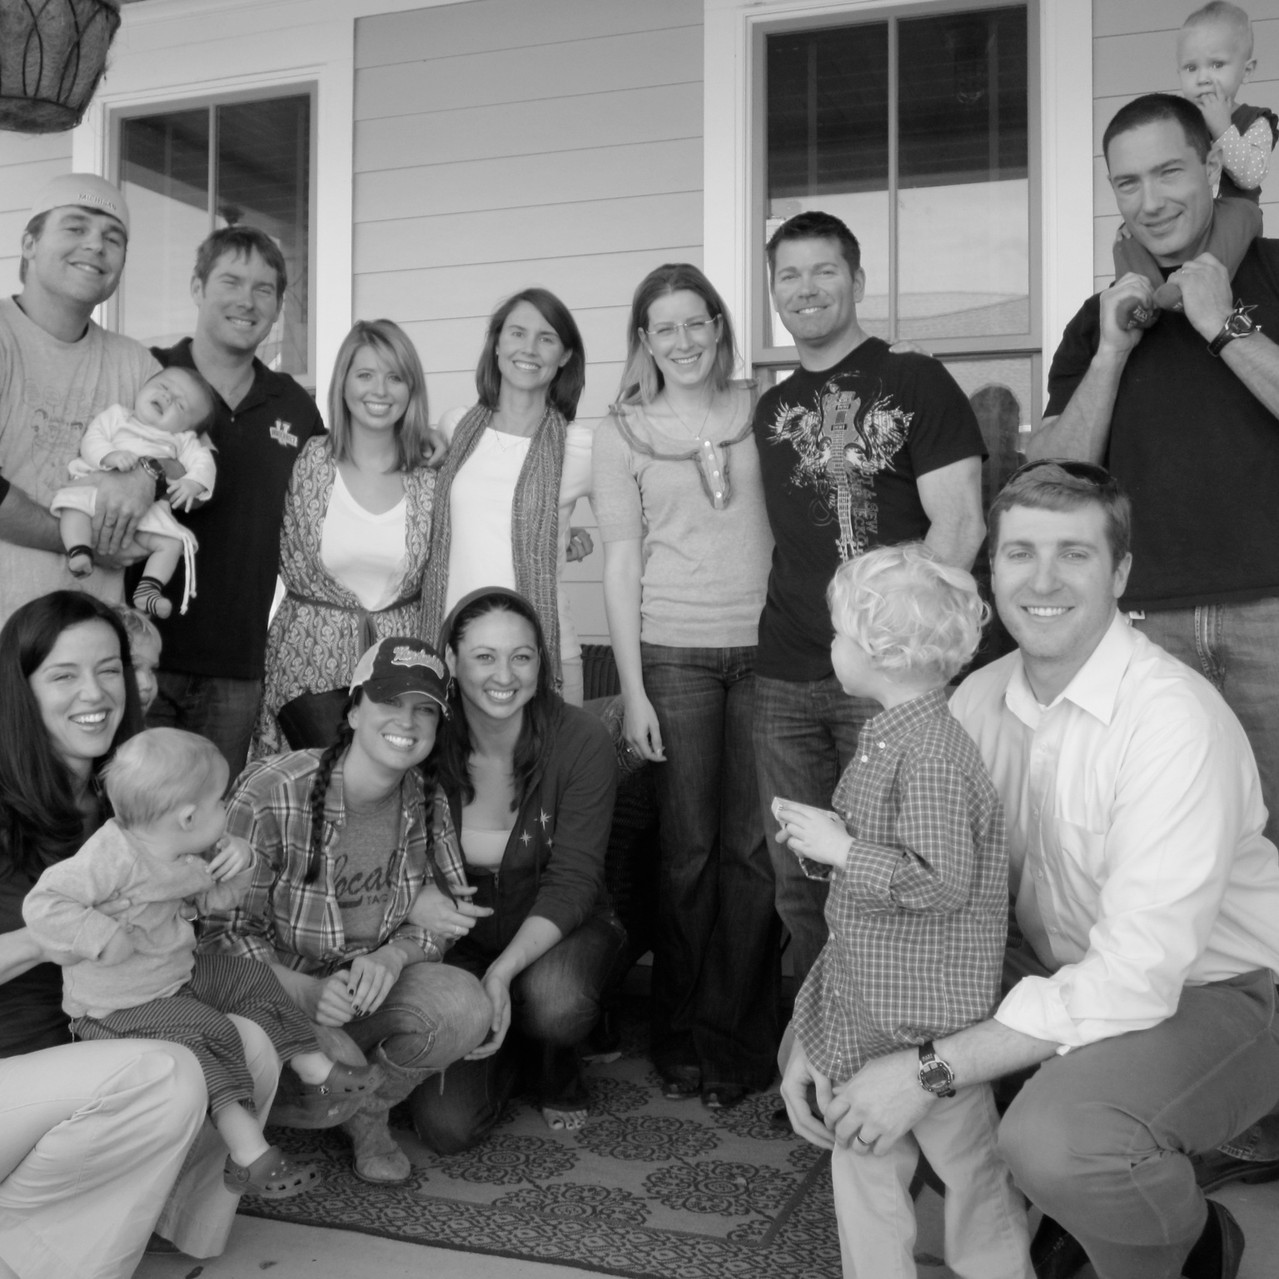 VFW Thanksgiving 2011